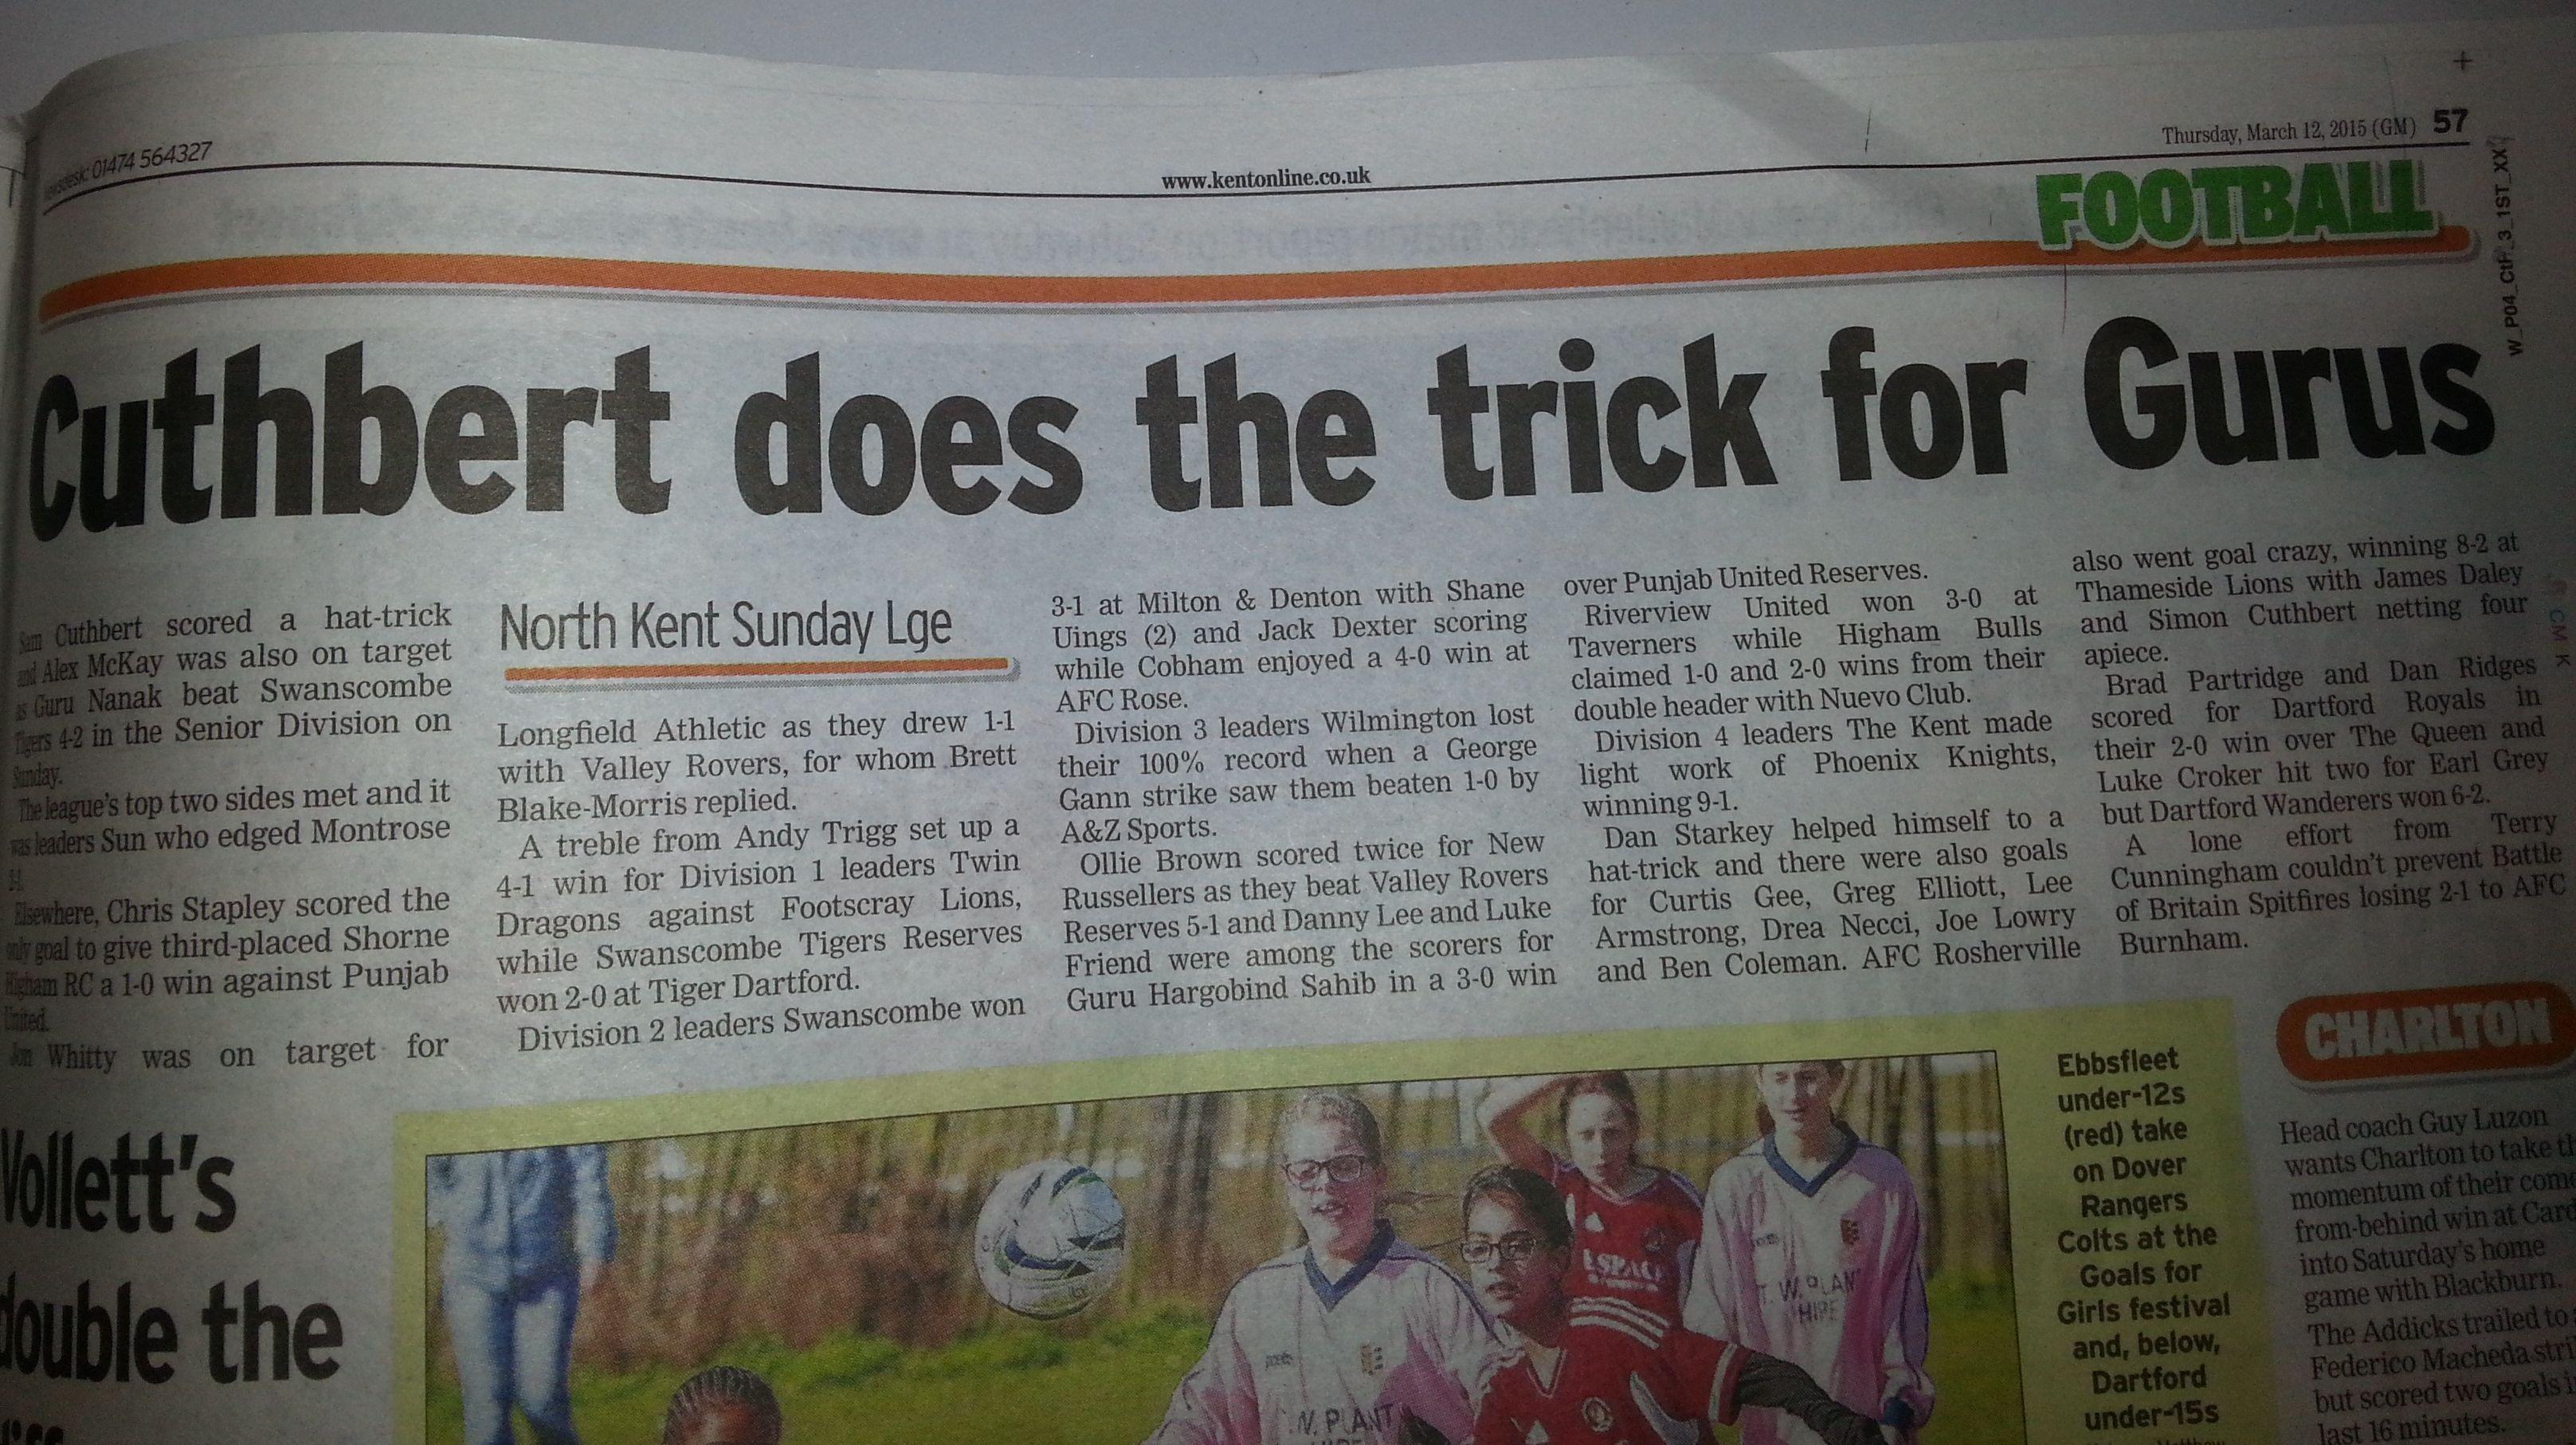 Sam Cuthbert Hatrick Headline - March 2015